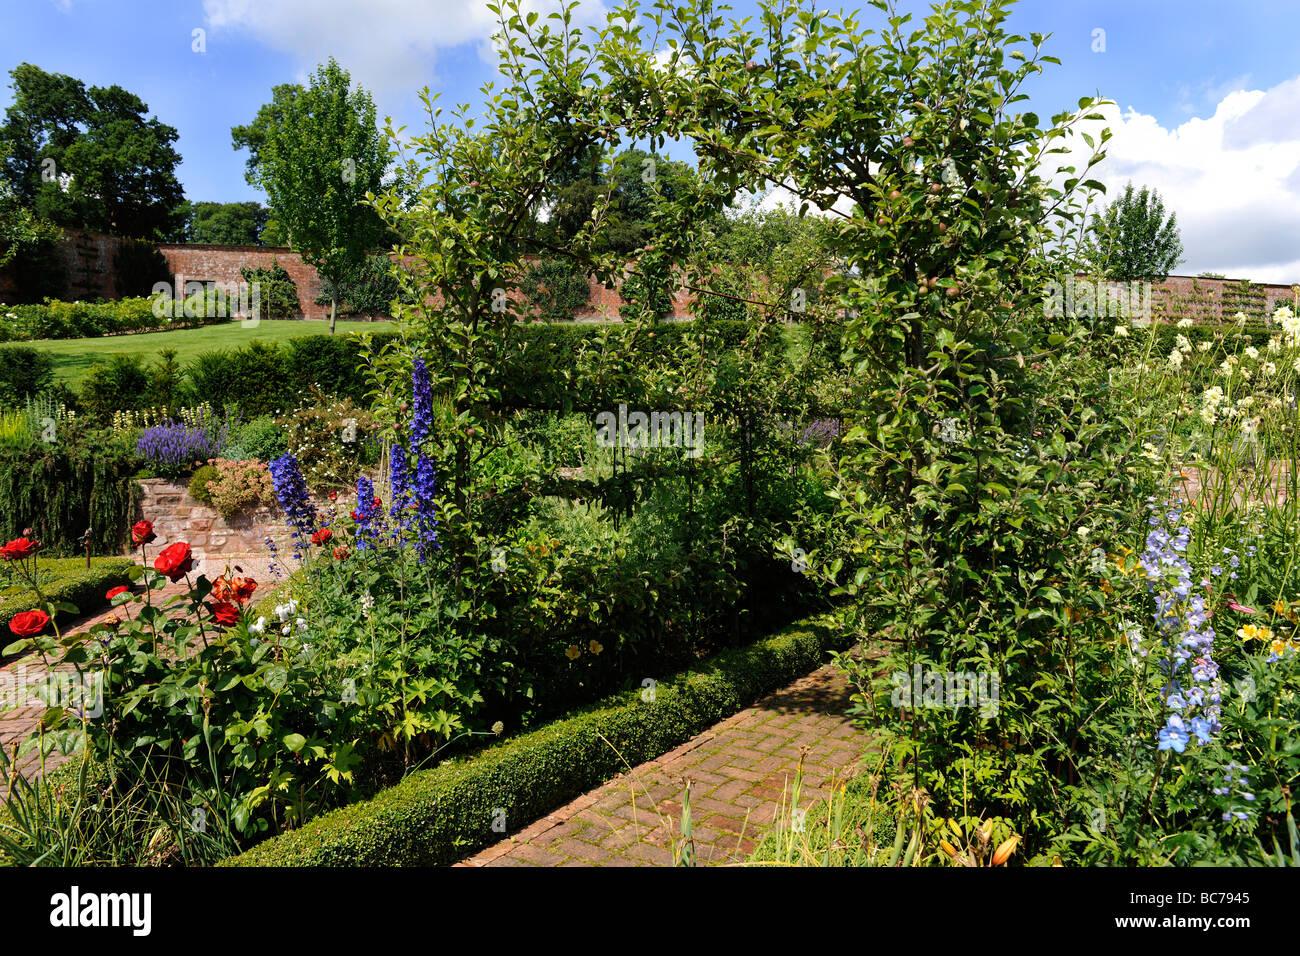 Landscaped English garden in Holcombe Court, Devon, UK - Stock Image